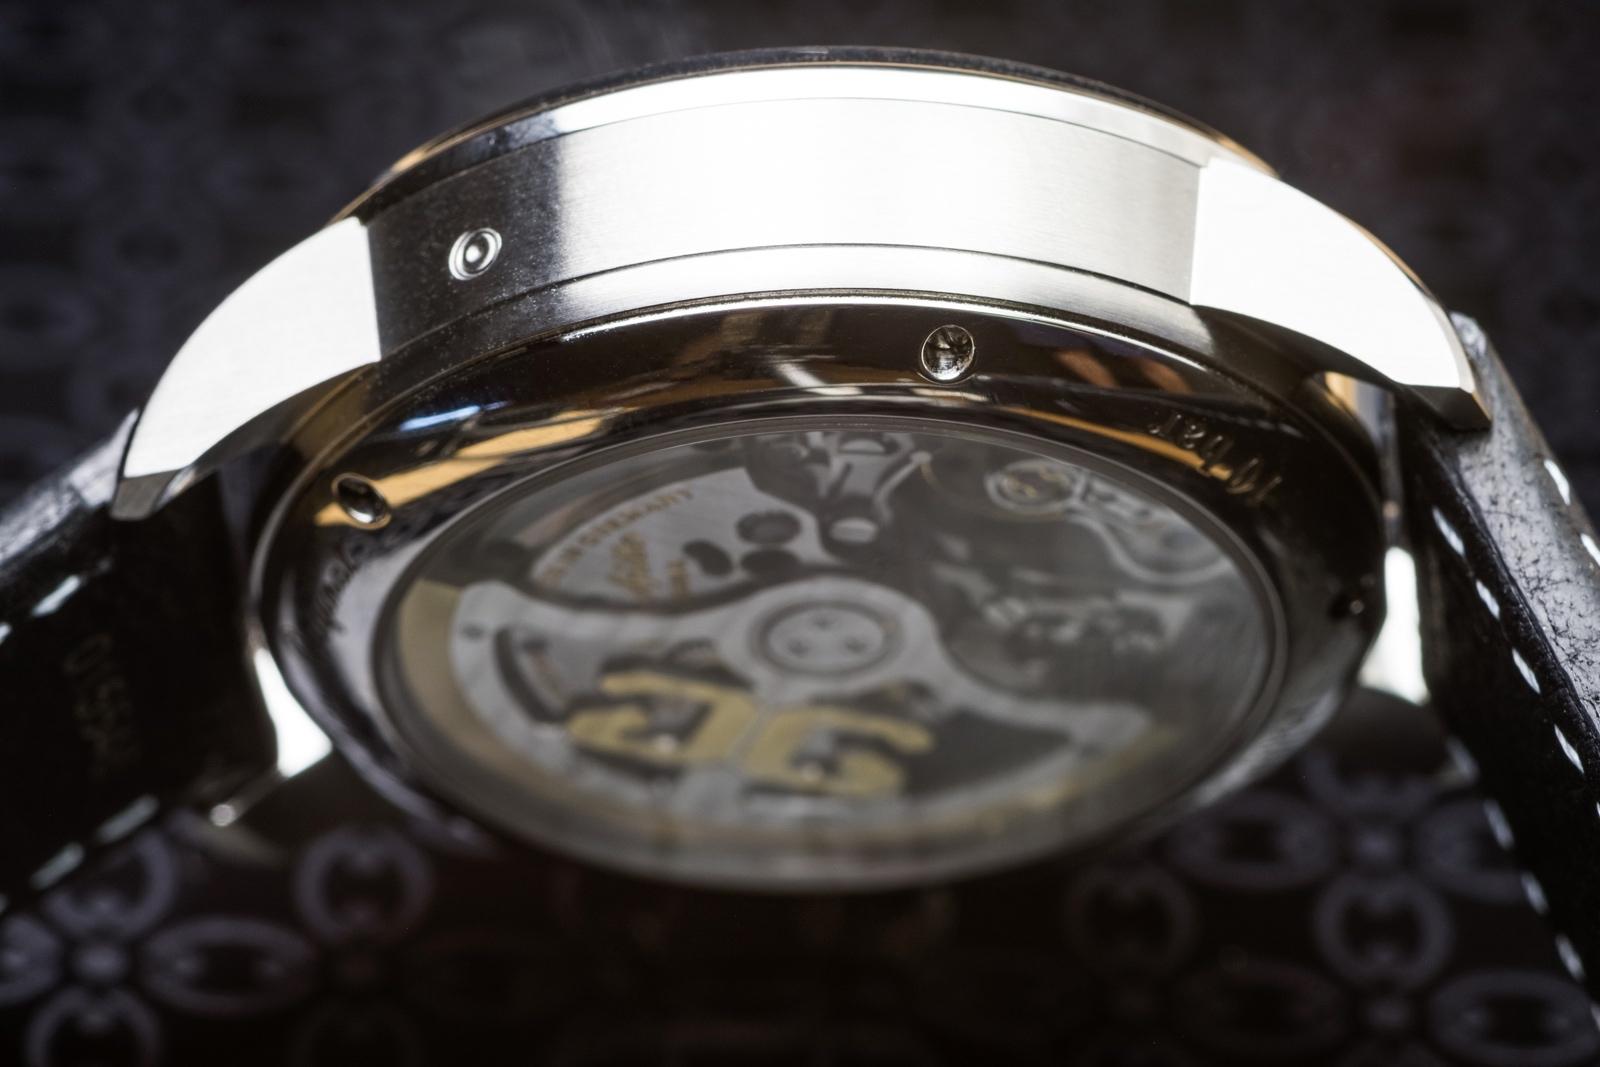 Glashütte Original Senator Chronograph Panorama Date Case Profile